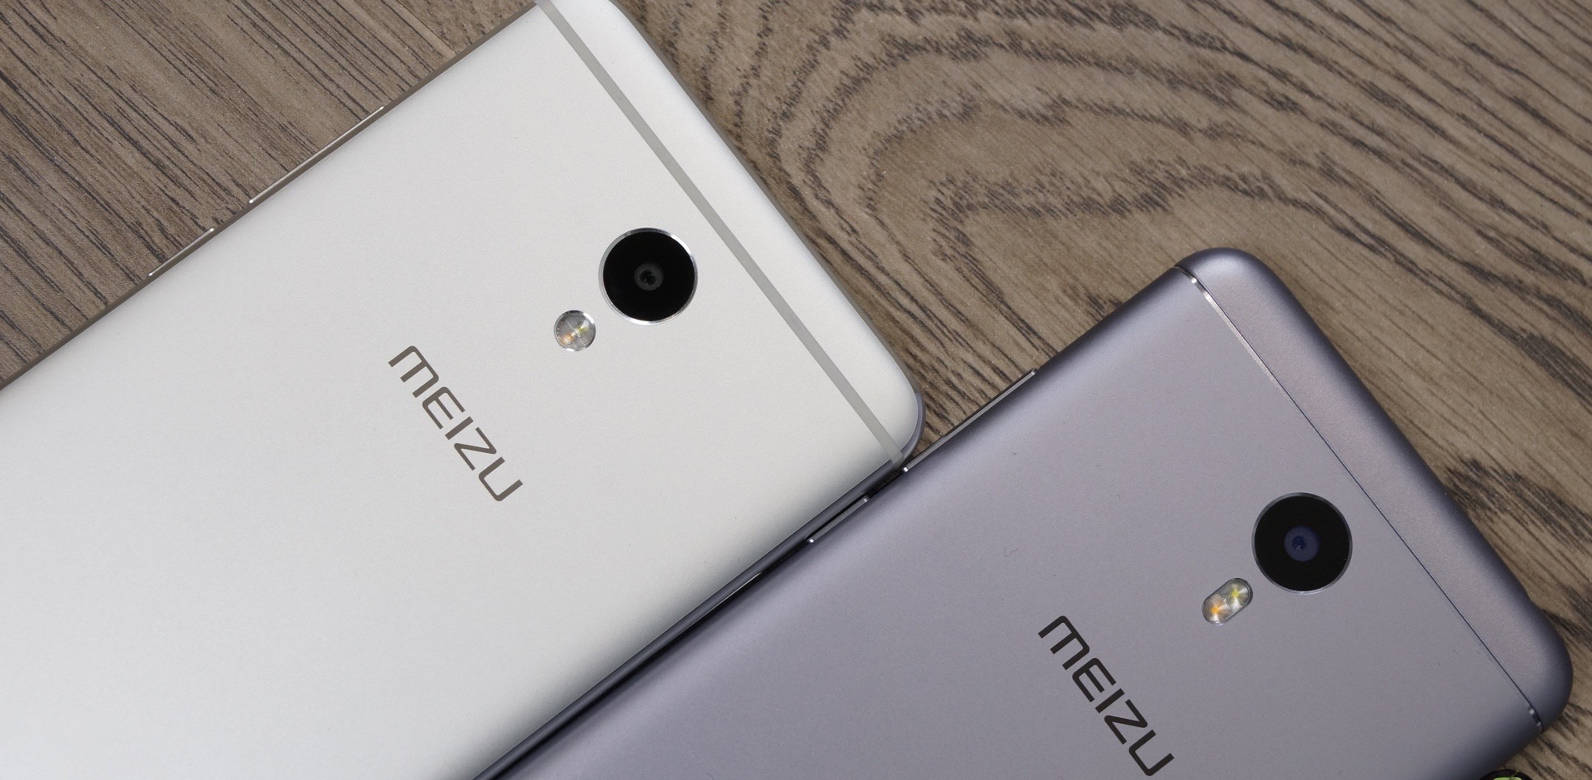 Сравнение Meizu M5 и Meizu m5 note